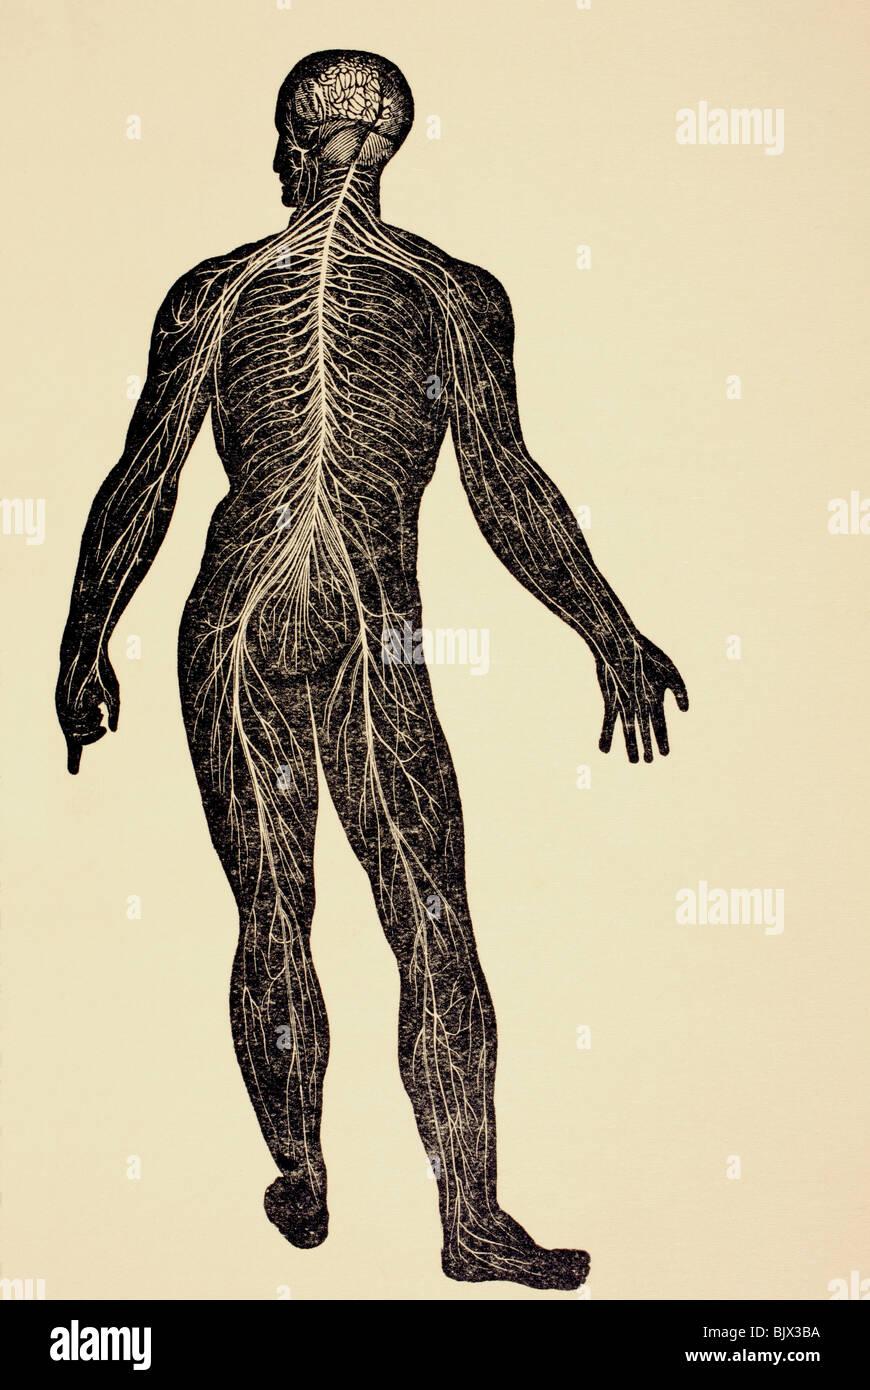 Das menschliche Nervensystem Stockfoto, Bild: 28847598 - Alamy